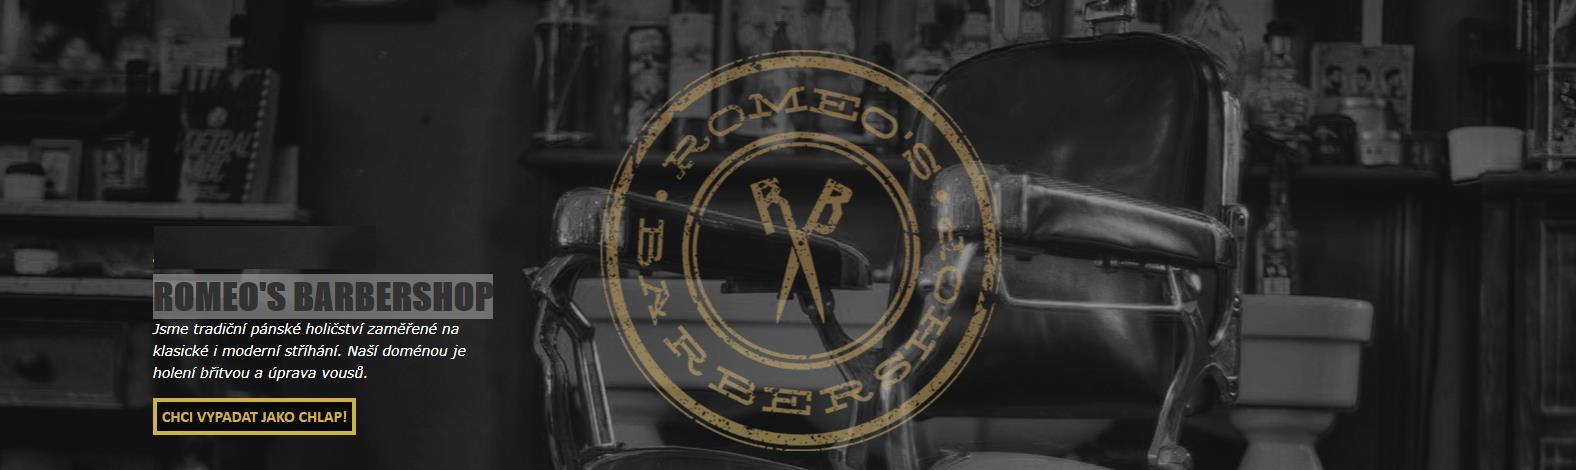 Barbershop Romeo's